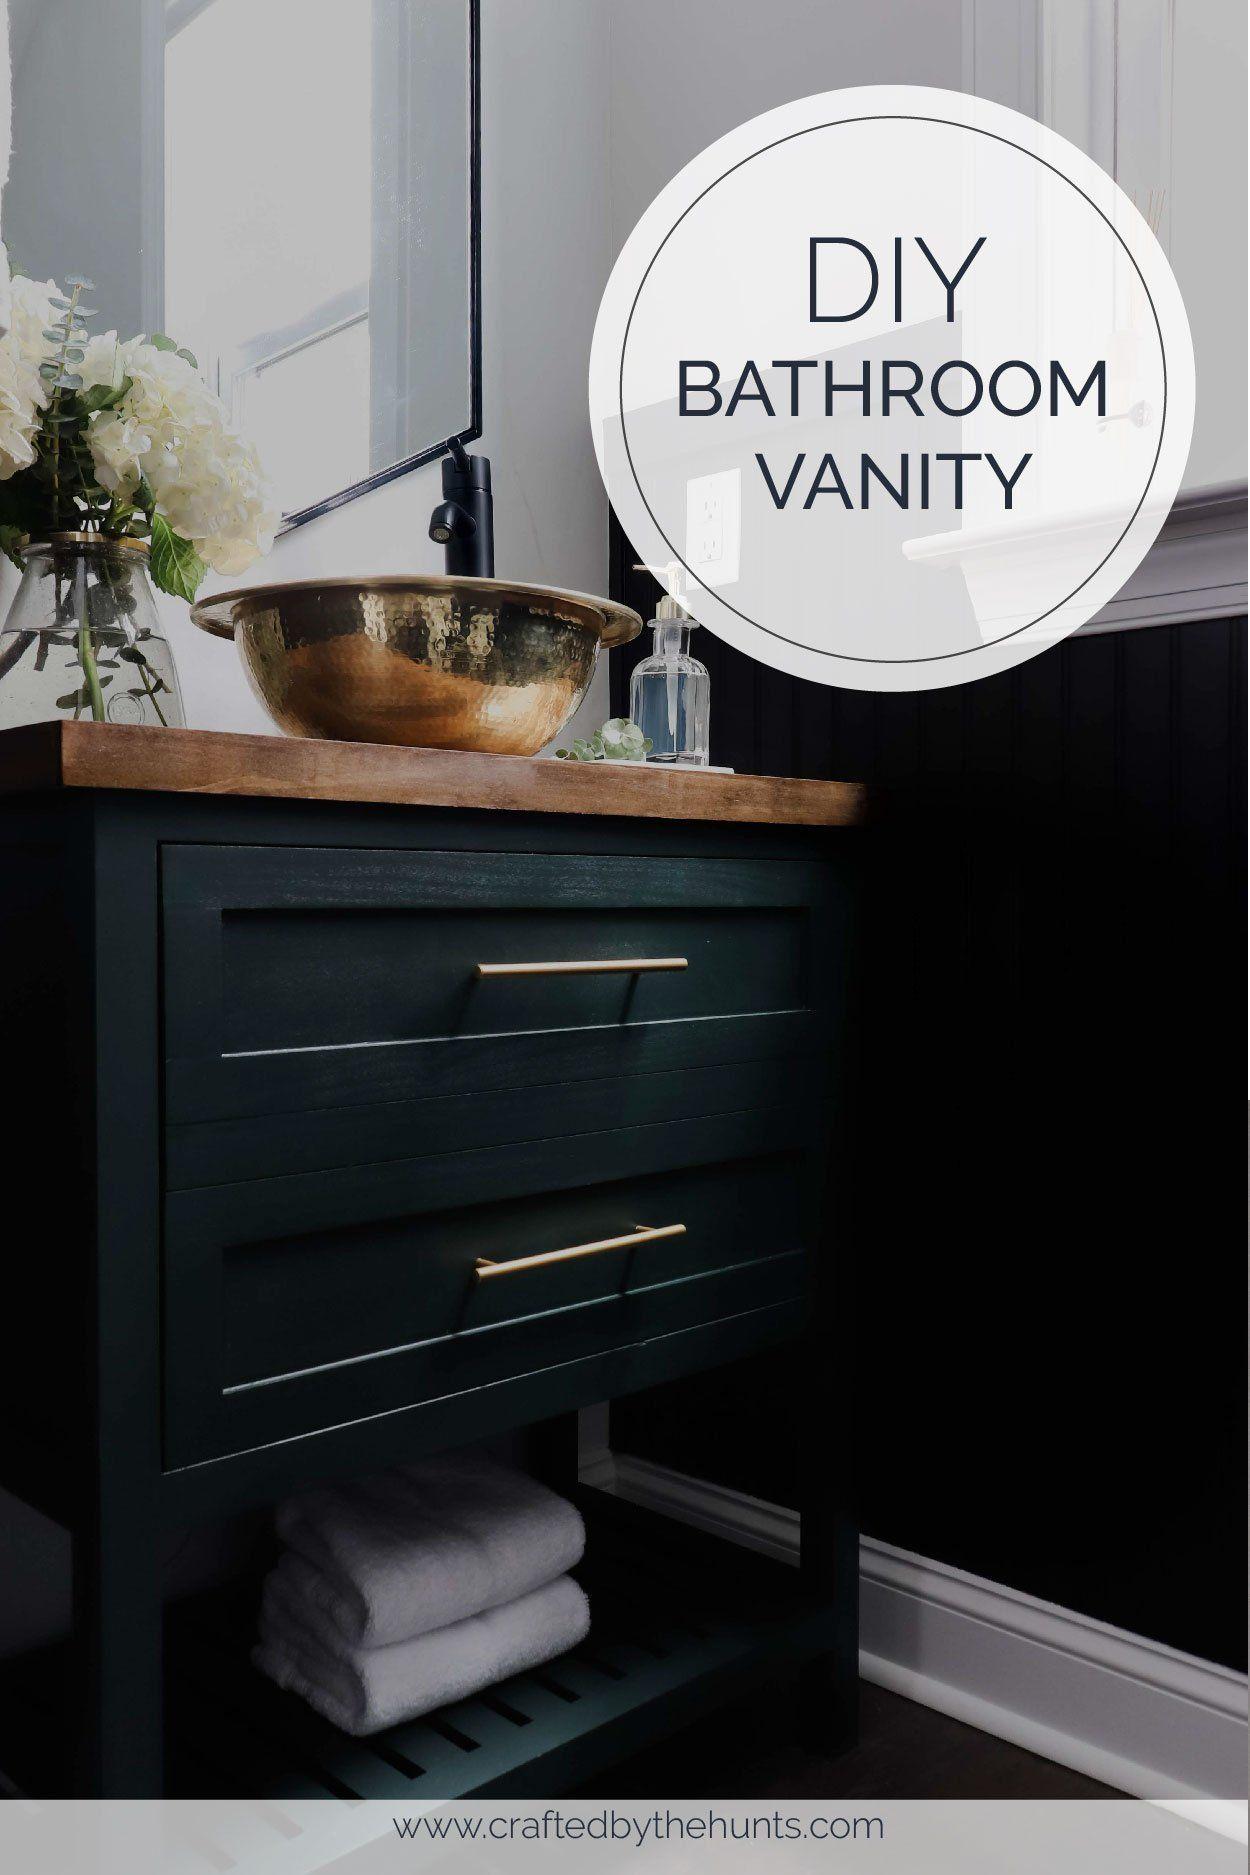 Photo of How to Build a DIY Bathroom Vanity